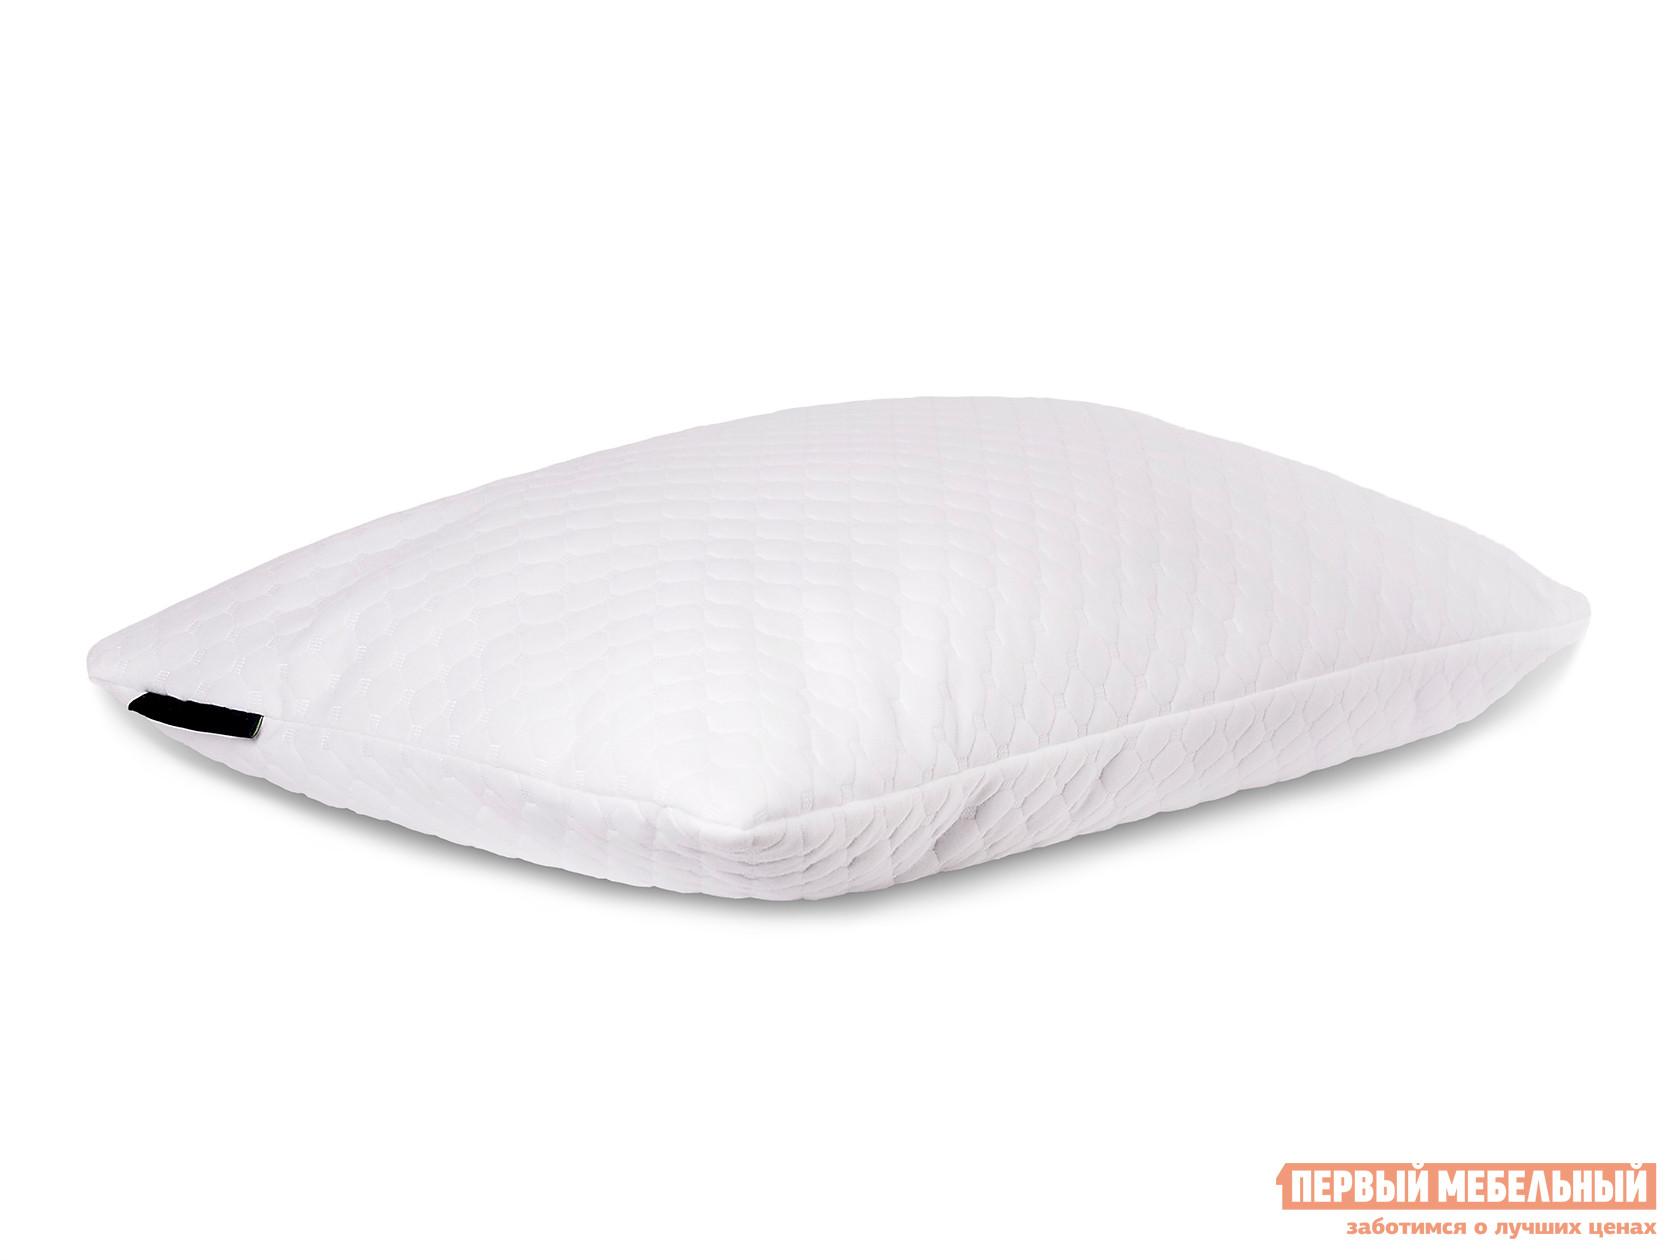 Подушка  Гранд Комфорт M/L Белый, Высота 15 см